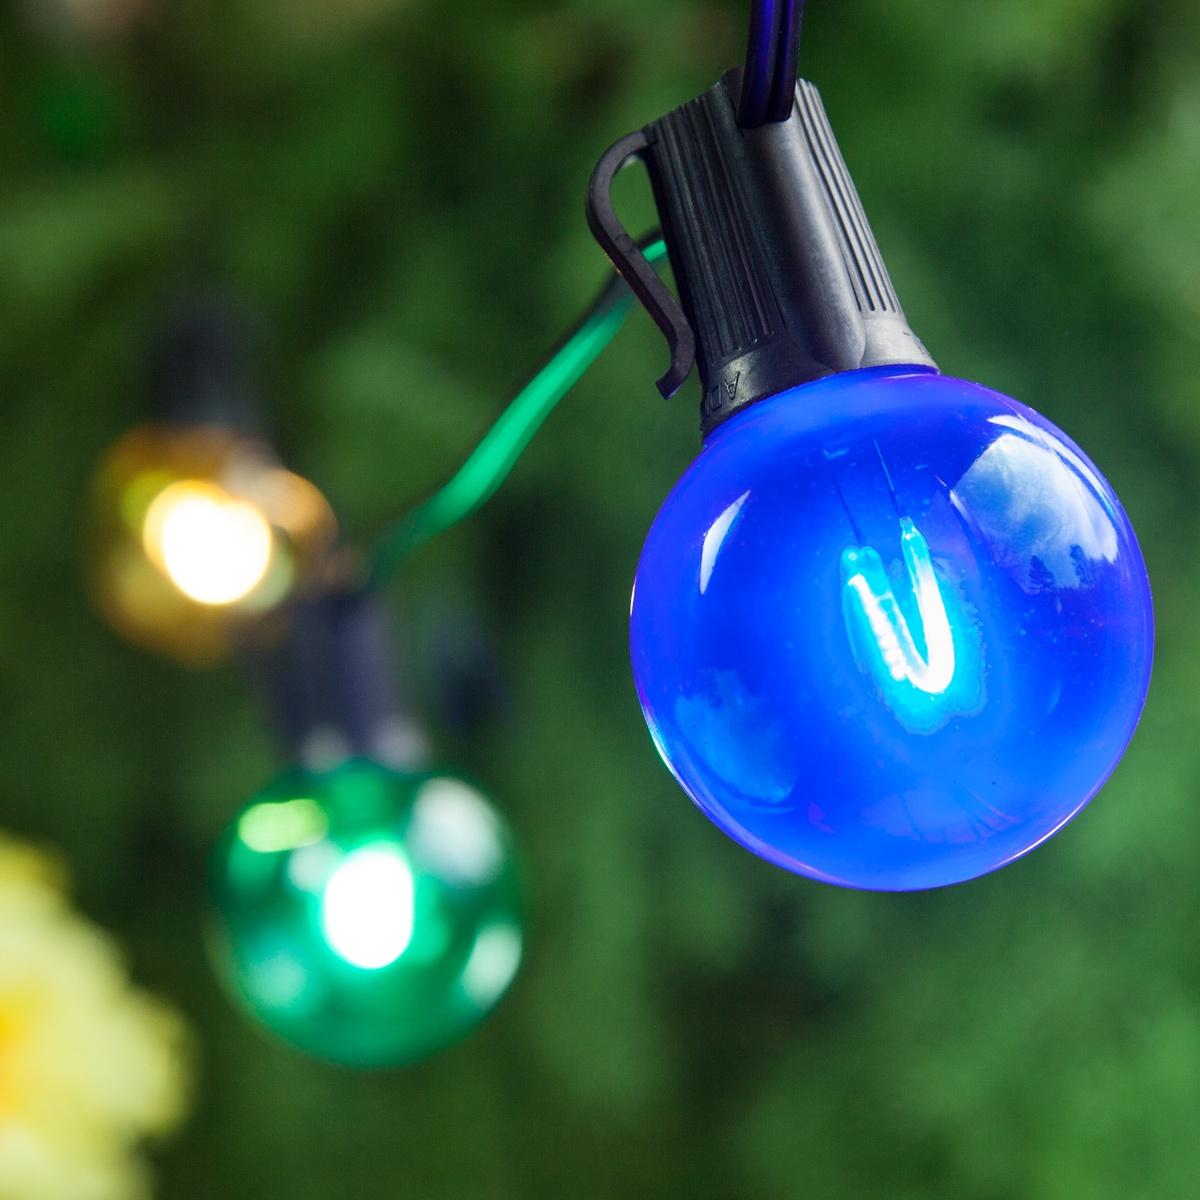 patio lights multicolor led party lights 50 g50 e17 bulbs black wire. Black Bedroom Furniture Sets. Home Design Ideas